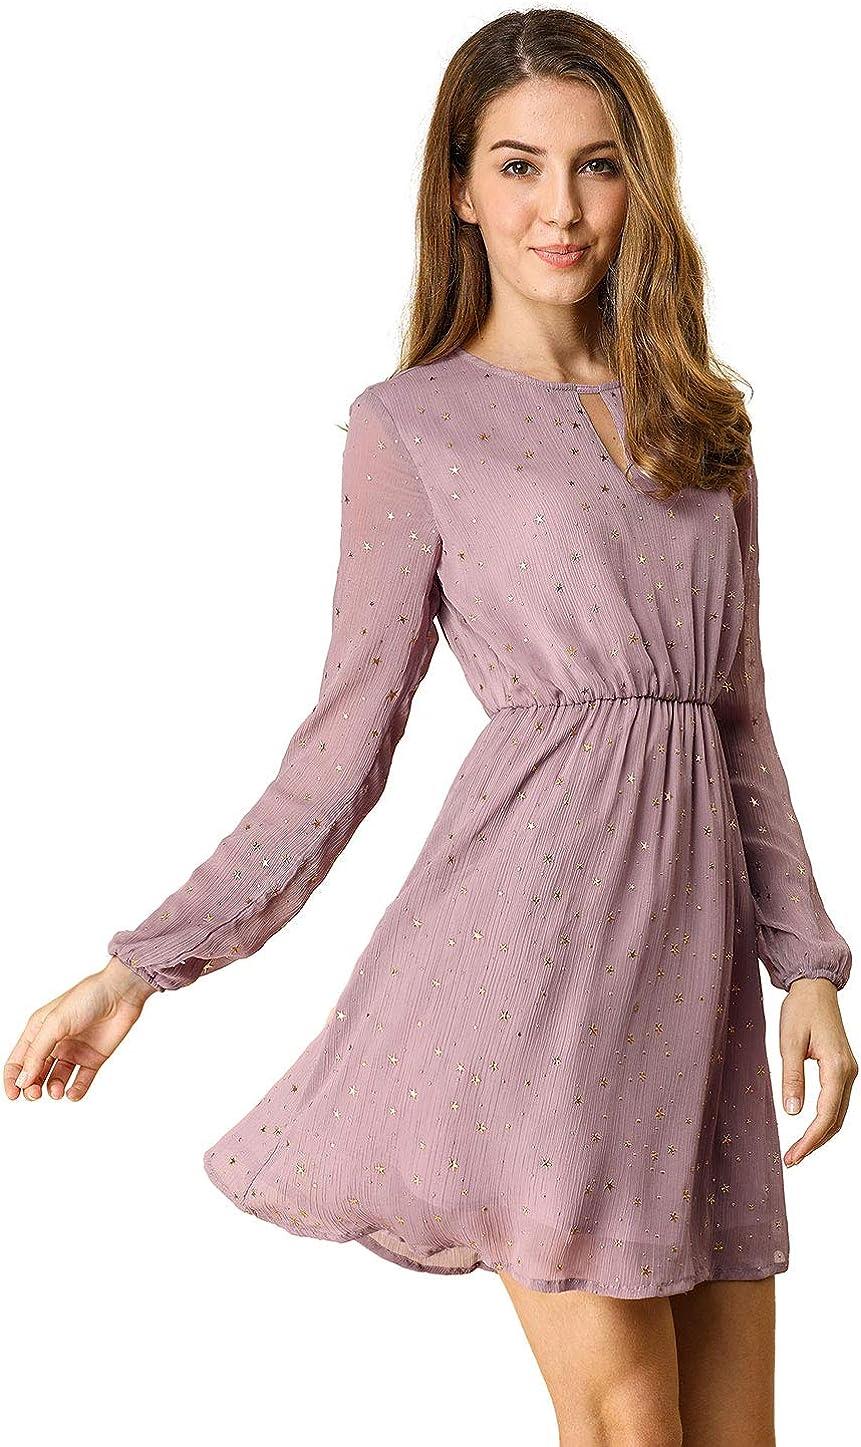 Allegra K Women's Choker V Neck Vintage Flared Gilding Metallic Shiny Star A-Line Dress